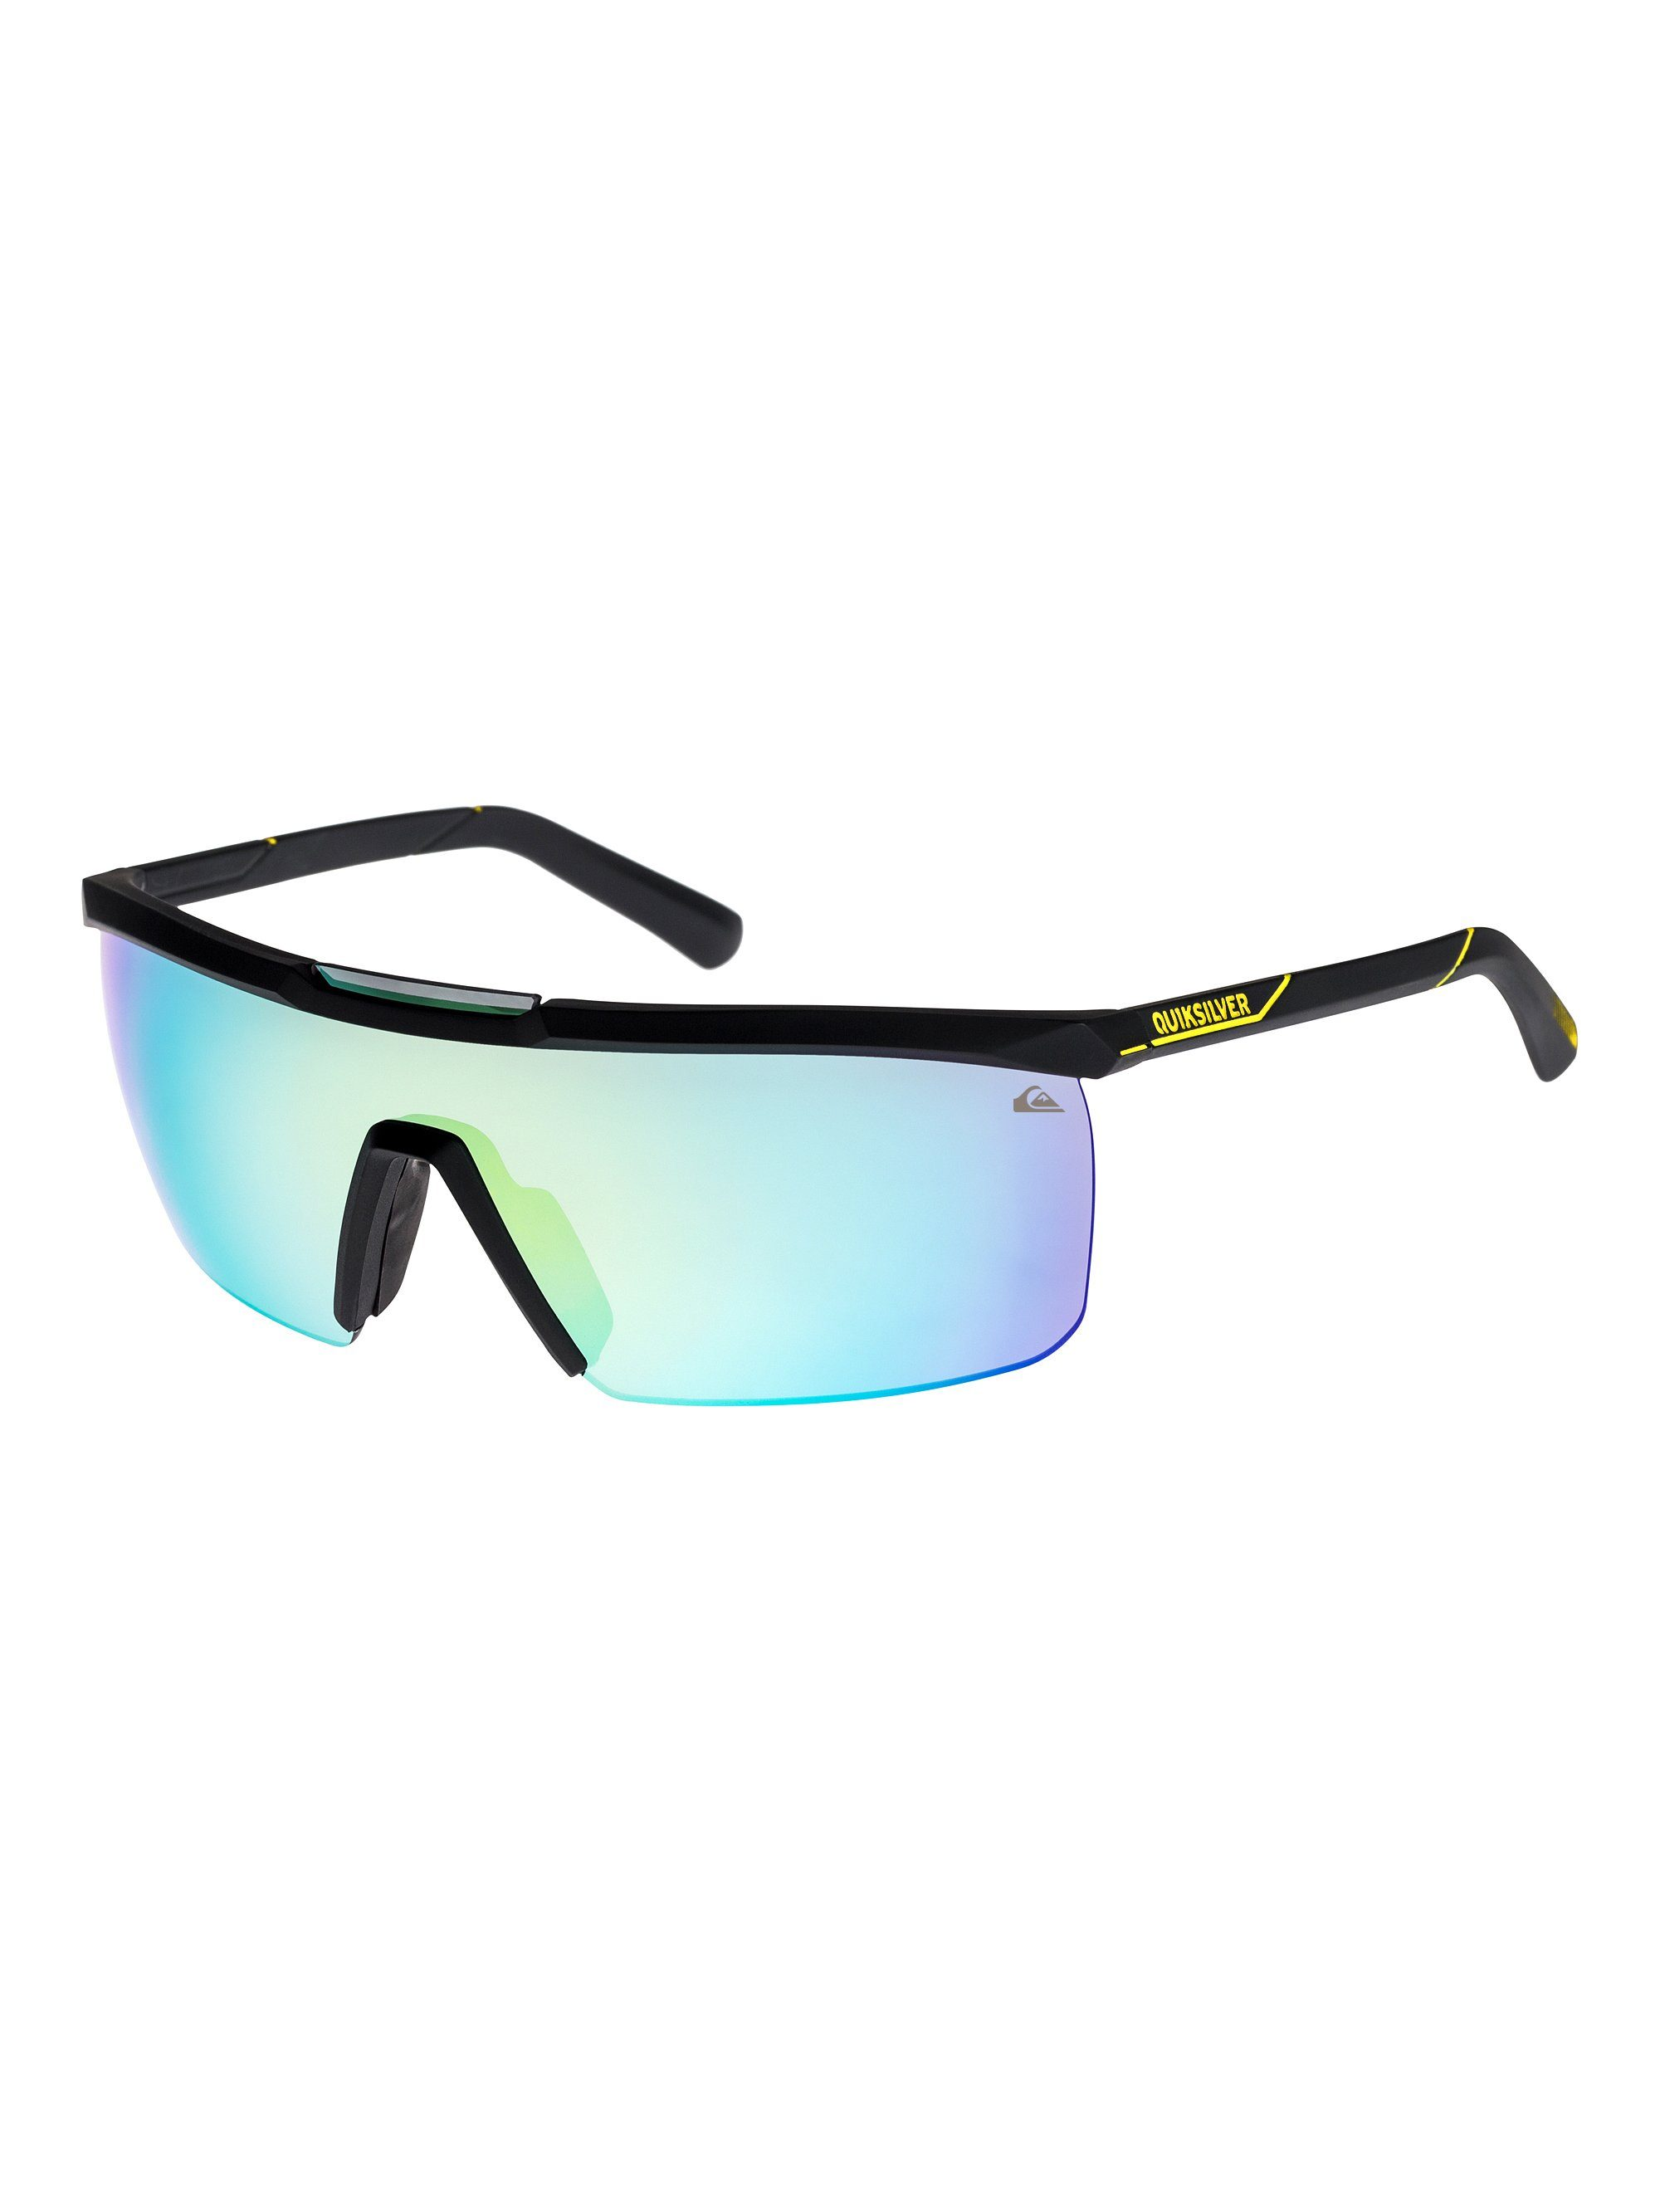 Quiksilver Sonnenbrille »Boneless«